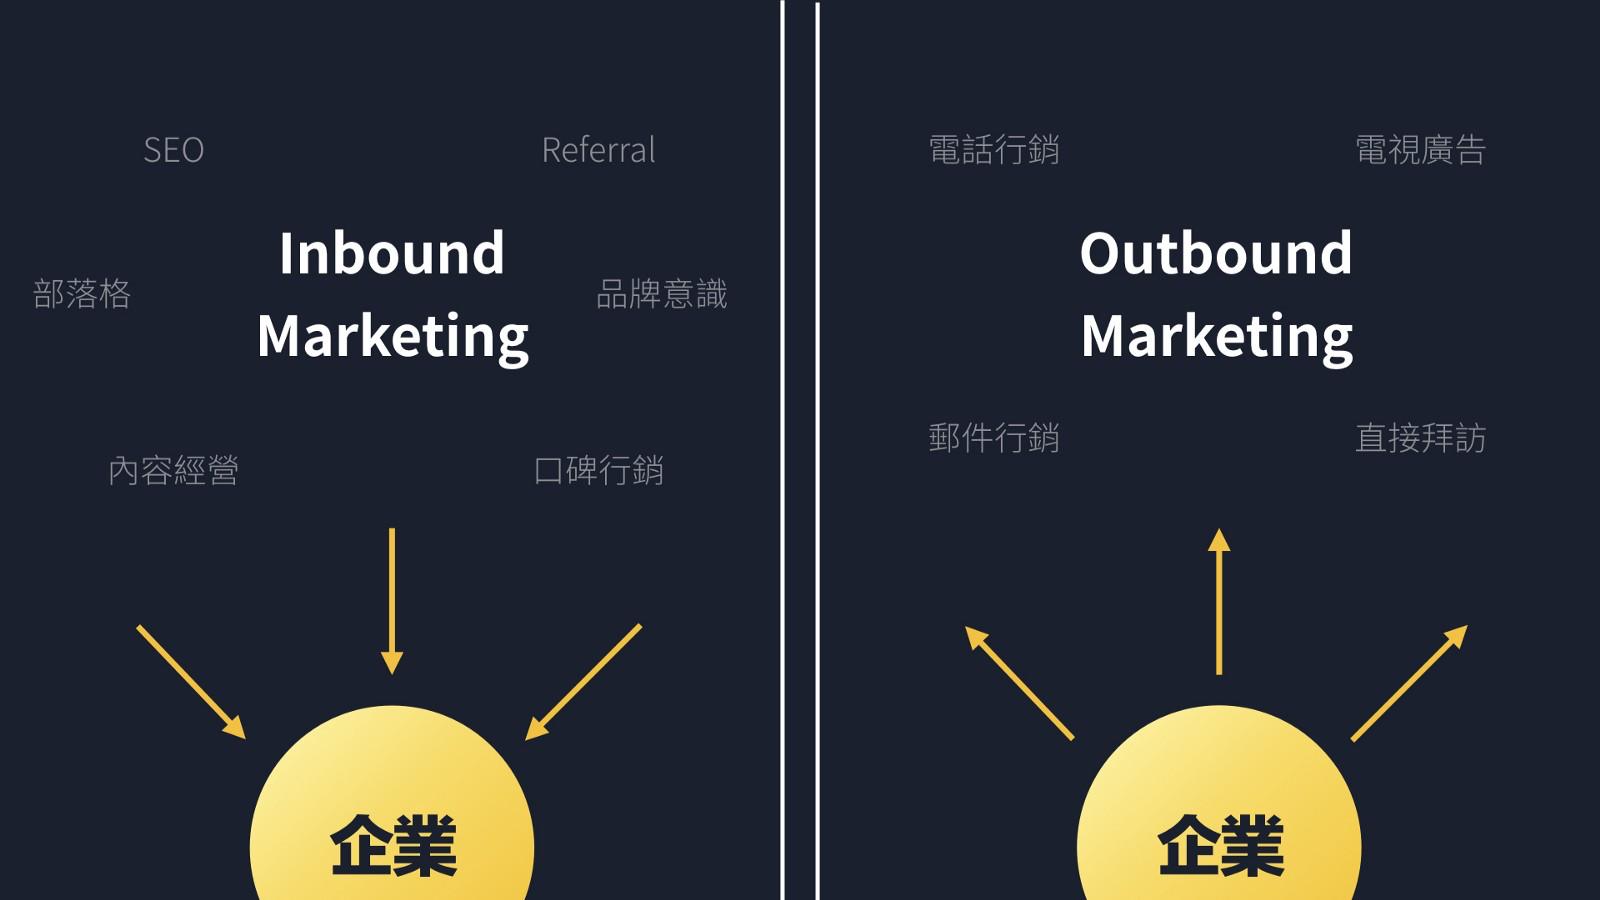 B2B 产品方法论(二):ToB 不该做大量传播?如何用 Inbound 集客式行销,达到产品广告化?